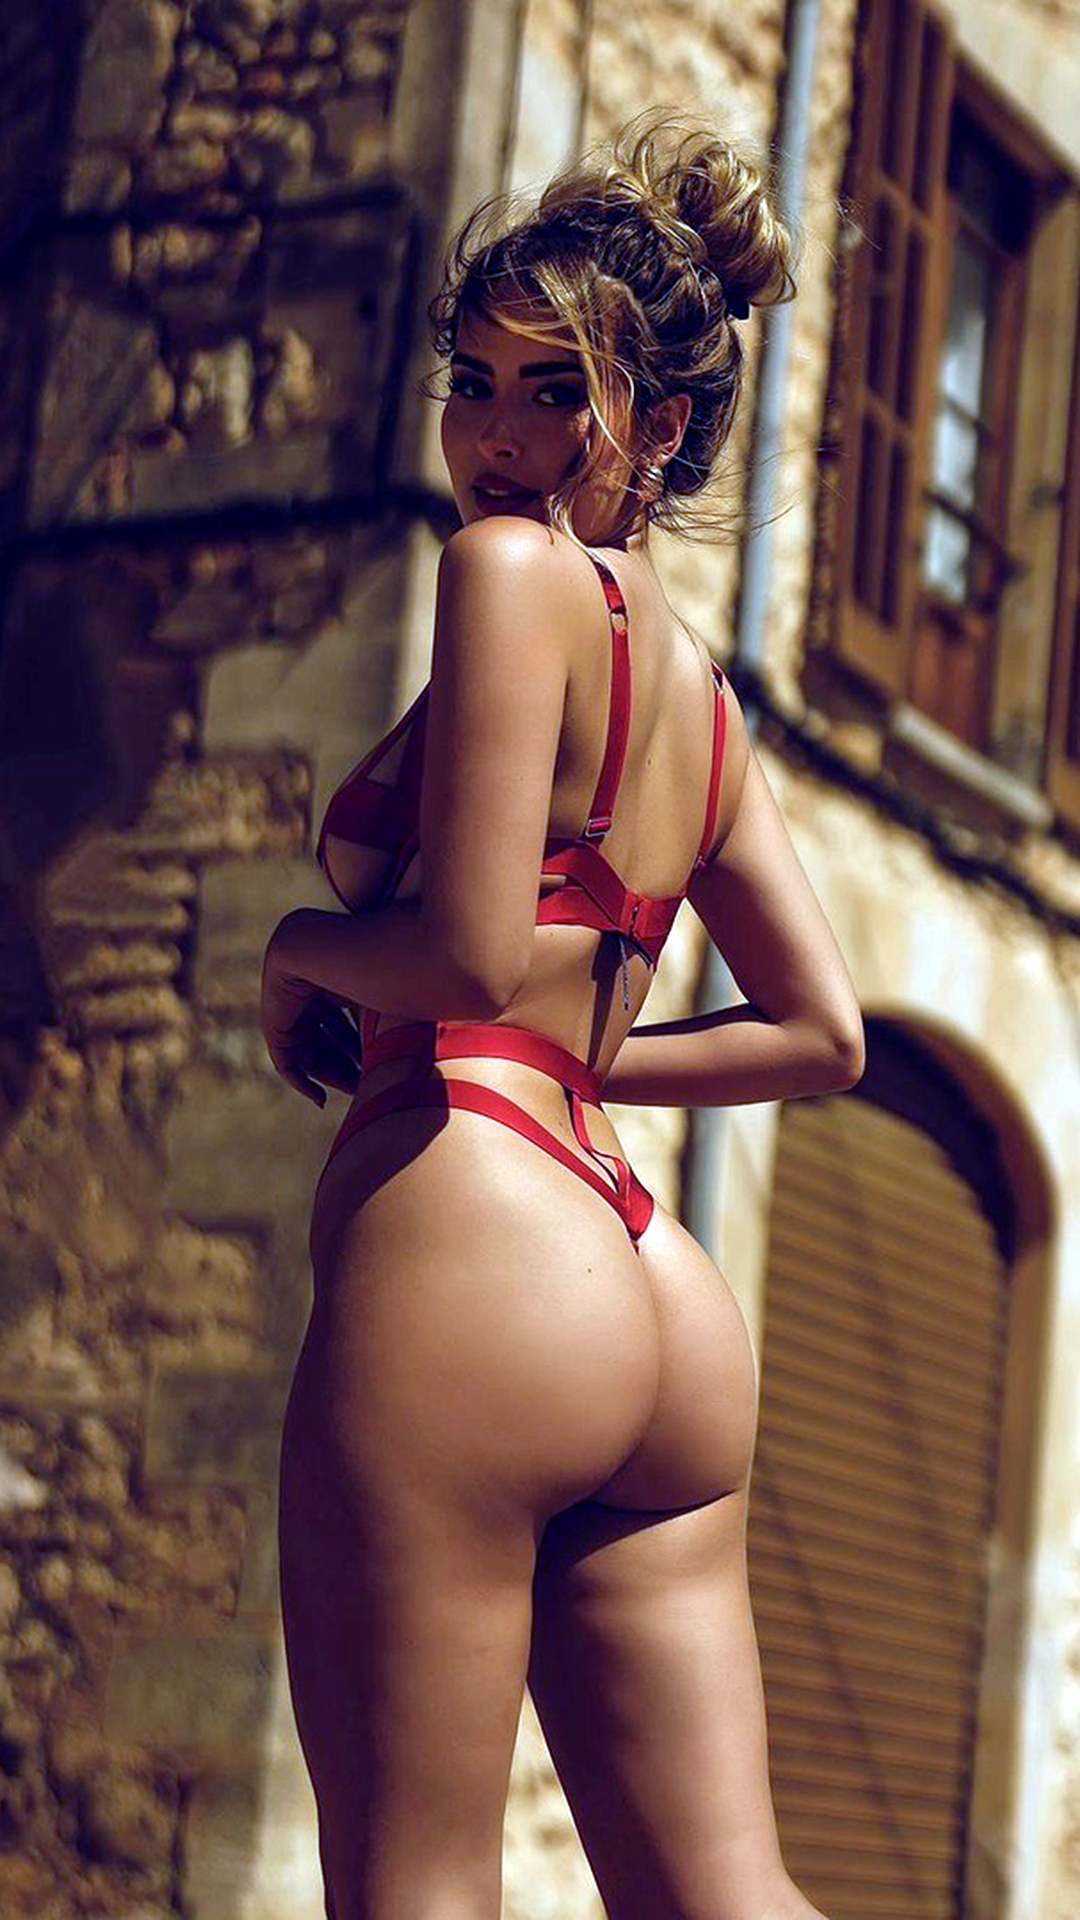 Blonde escorts in nyc dreams and desires high class escort agency speli